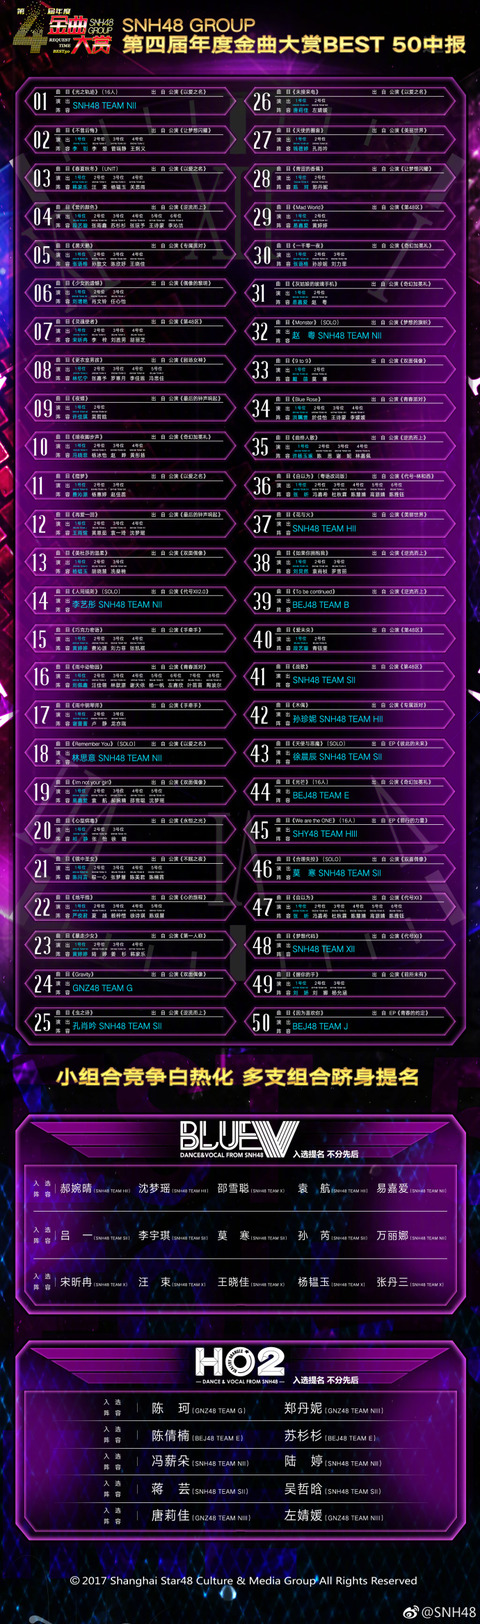 SNH48B50中171203